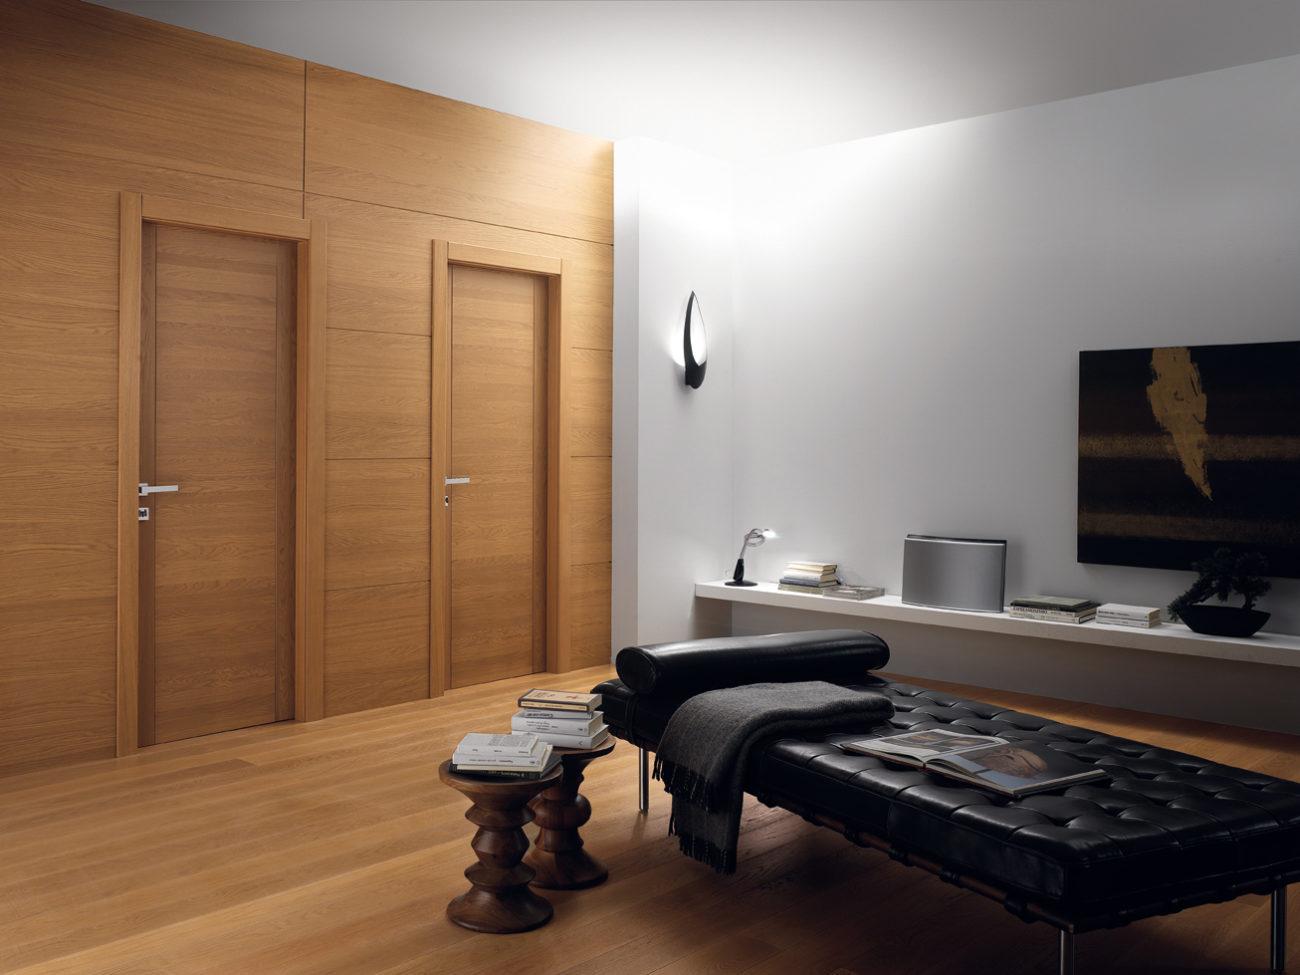 Porte in legno stile moderno Pangea - Garofoli